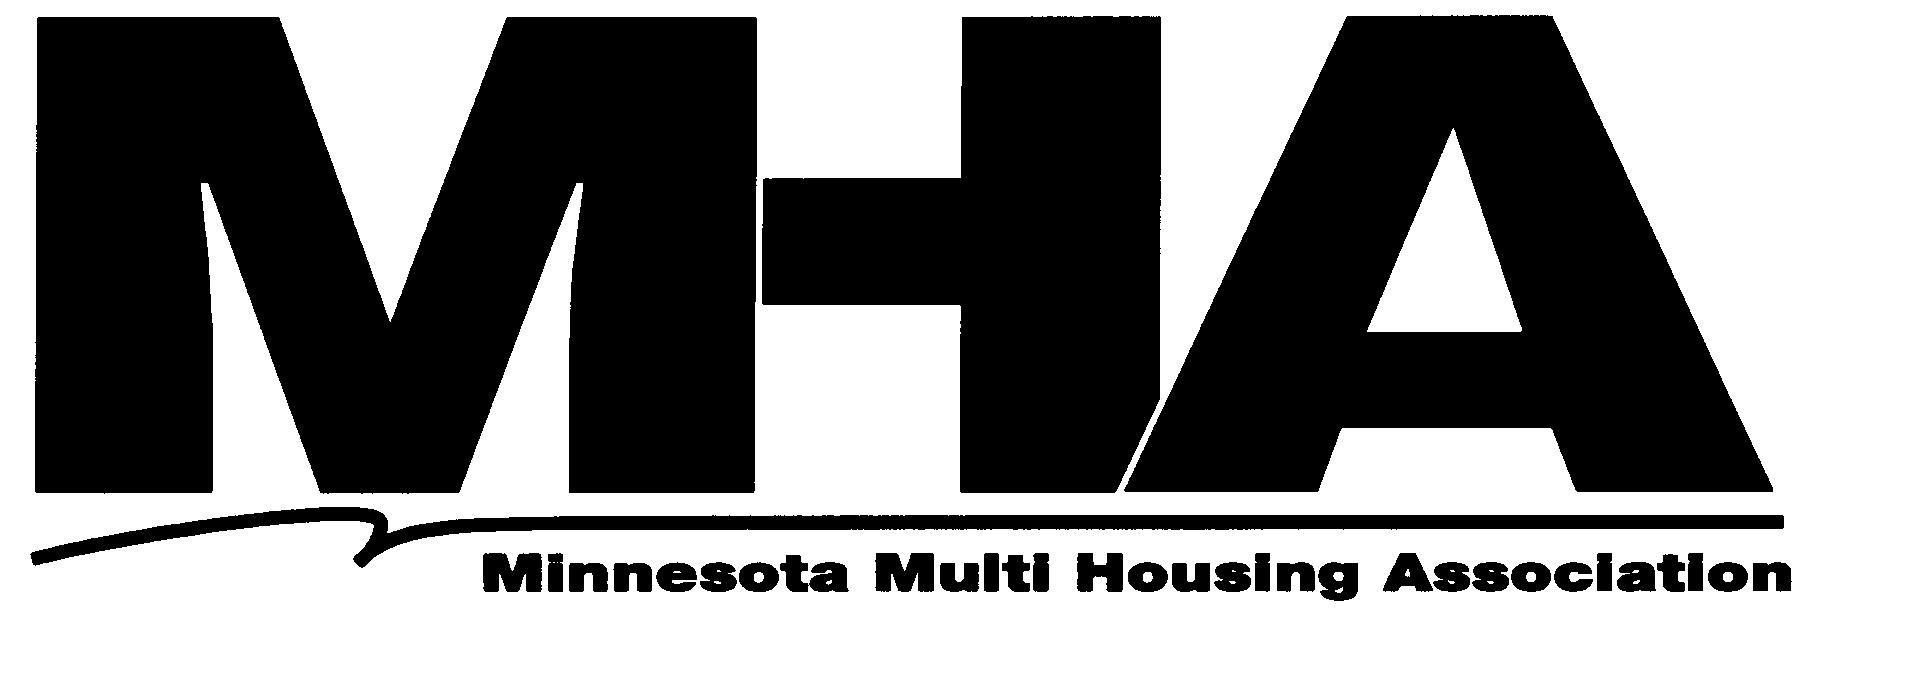 Mn Multi Housing Association The Nation S Best Association For Property Management Professionals And Vendors Property Management Management Nintendo Wii Logo